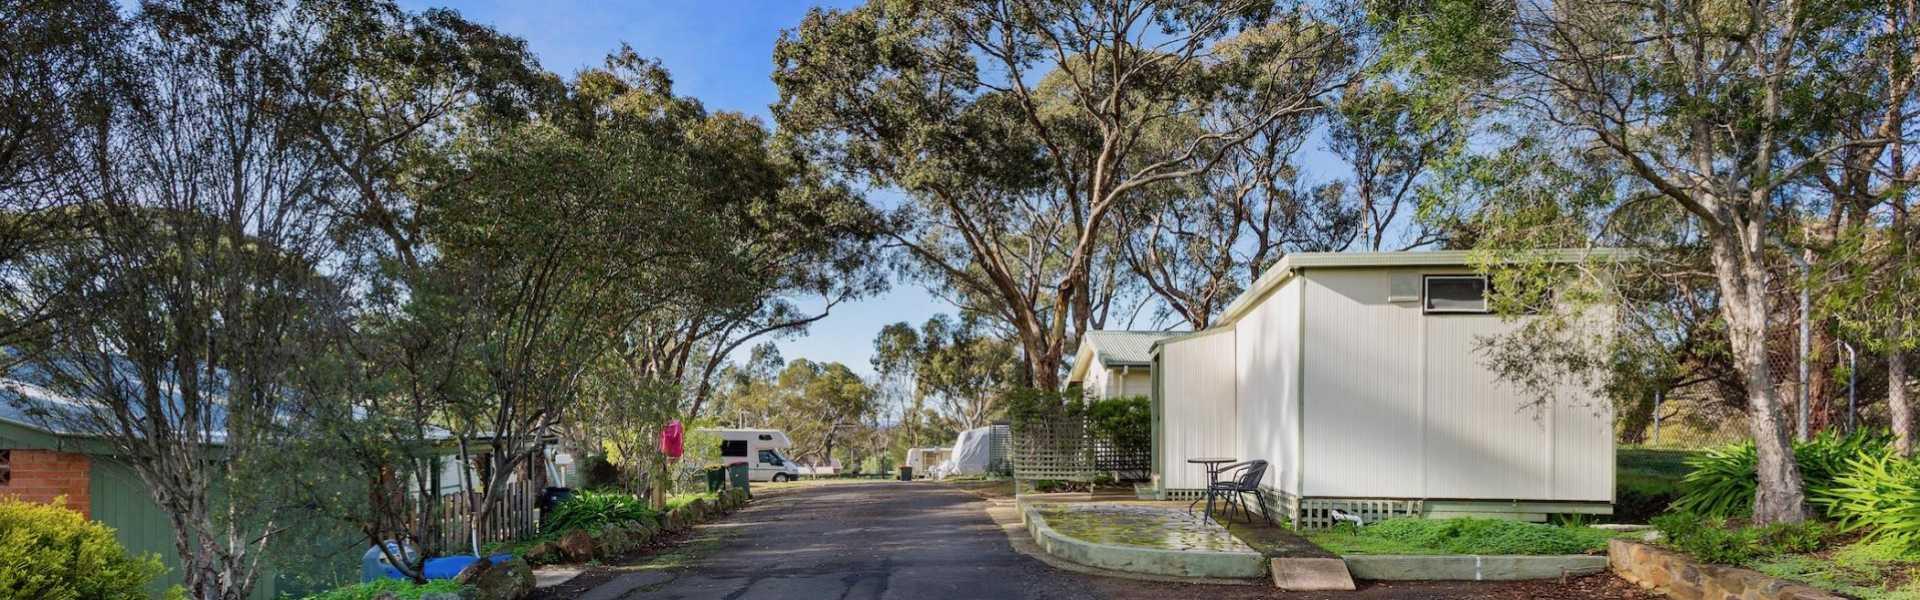 Kui Parks, Maldon Caravan Park